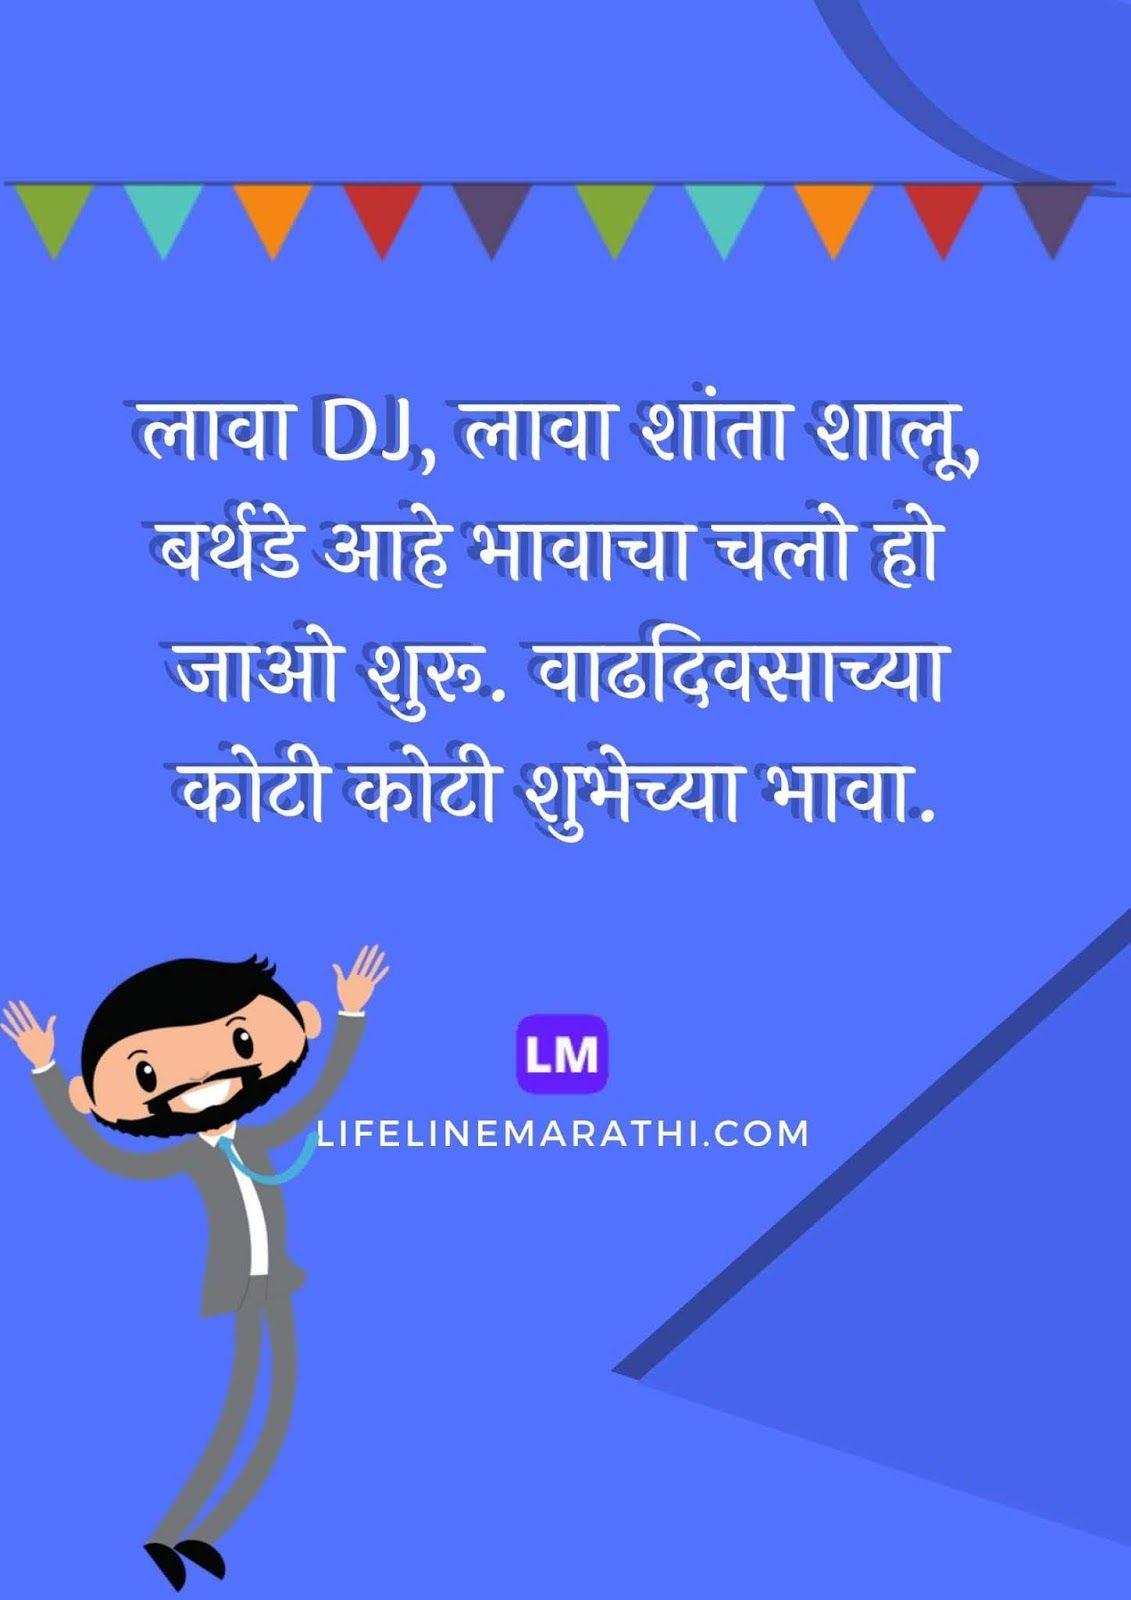 Birthday Wishes In Marathi Happy Birthday Quotes For Friends Friend Birthday Quotes Birthday Quotes For Best Friend